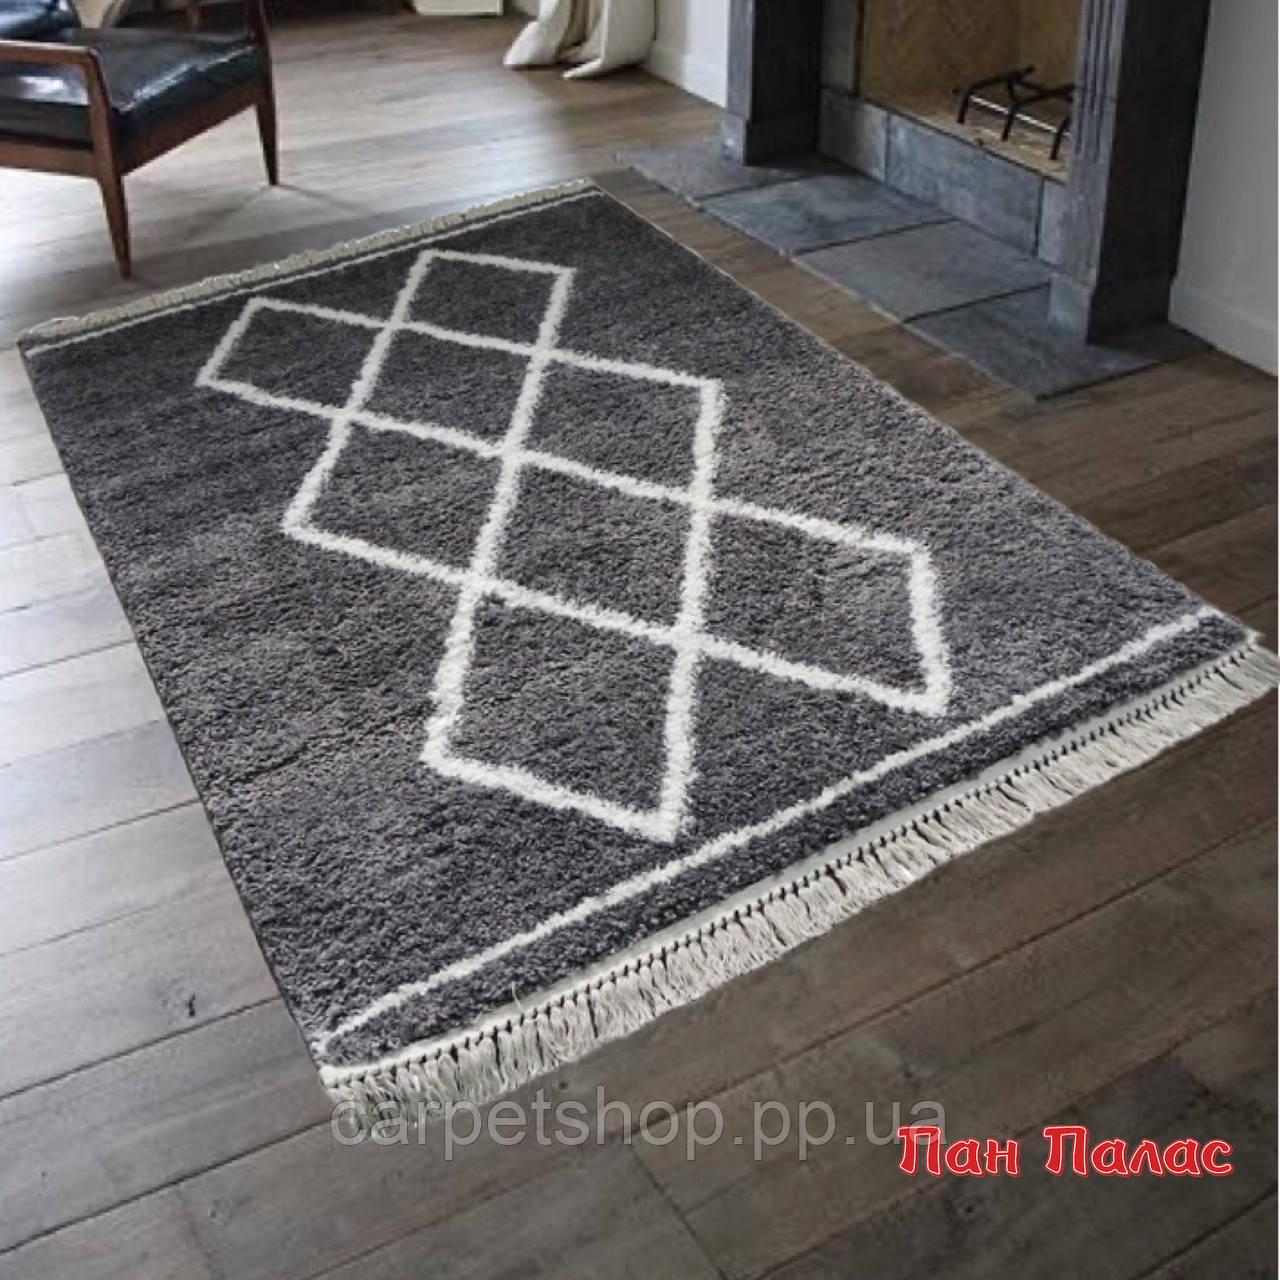 200х300 см. Ковер Tibet 12530/61 shaggy Karat carpet,